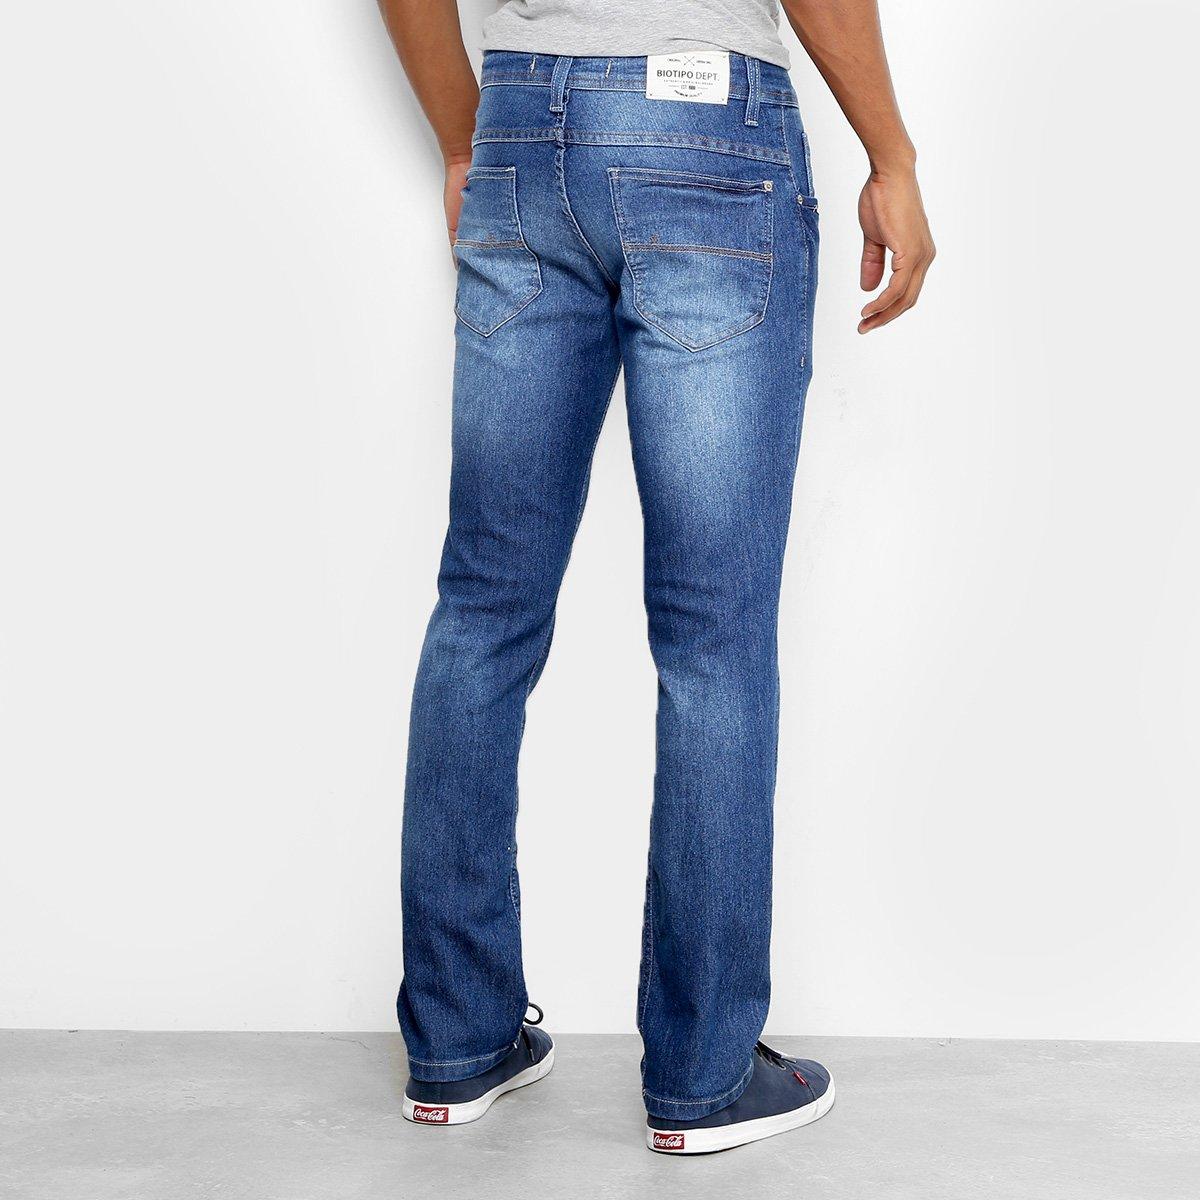 Calça Jeans Slim Biotipo Soft Estonada Masculina - Jeans - Compre ... f426293b8de